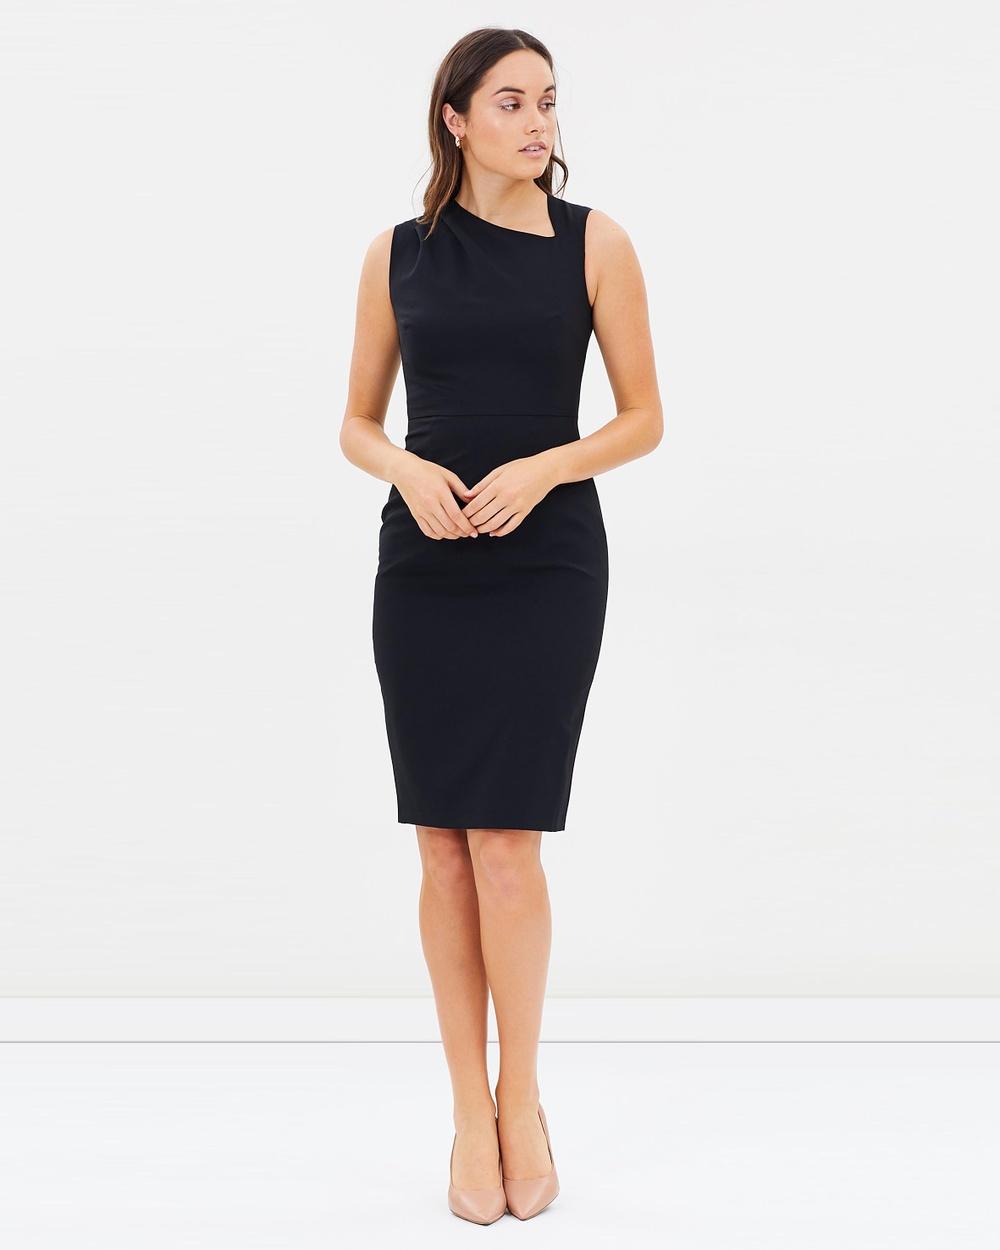 Dorothy Perkins Pleat Sleeveless Dress Dresses Black Pleat Sleeveless Dress